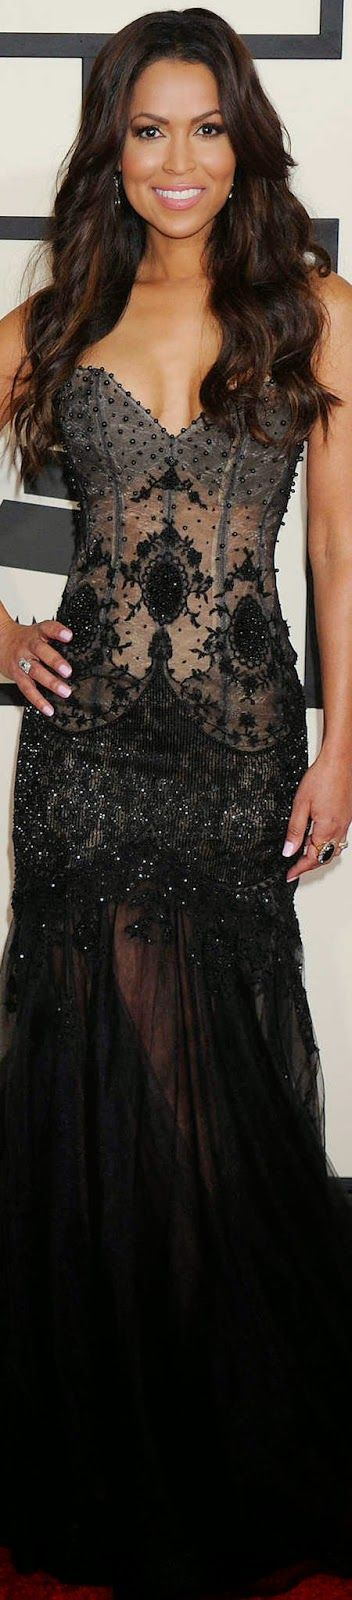 Tracey Edmonds                                               2015 Grammy Awards Red Carpet